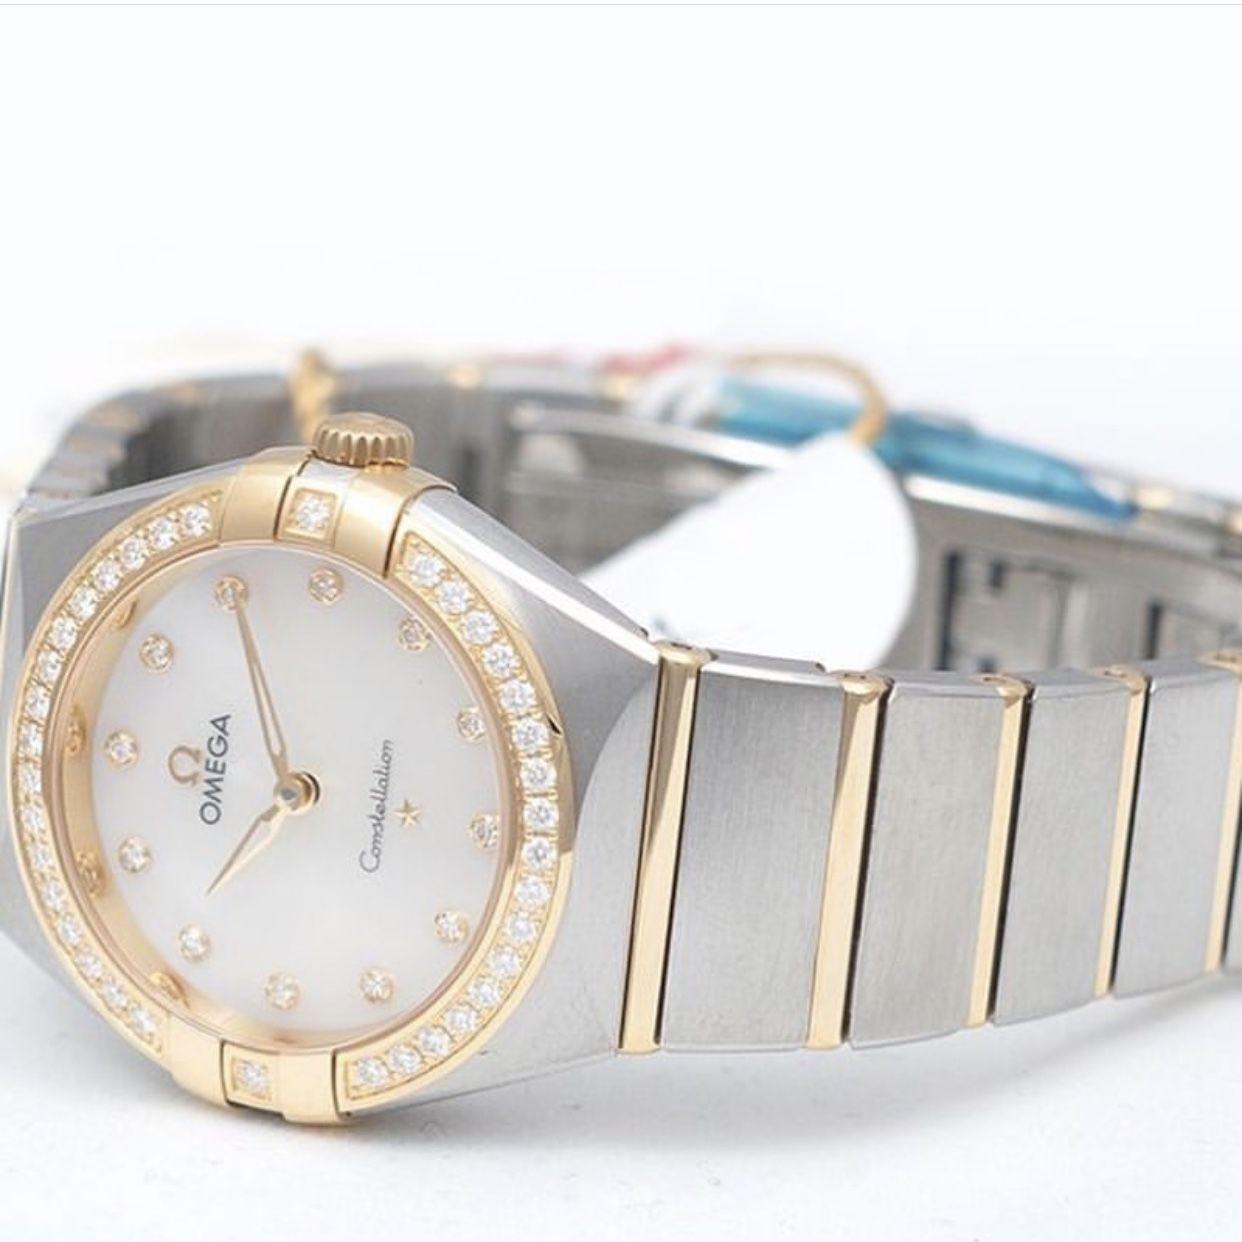 Pin By النعمان للفضة ساعات عقيق يمني On ساعات نسائية بيع صنعاء اليمن ساعة افضل موديلات Bracelet Watch Rolex Watches Accessories